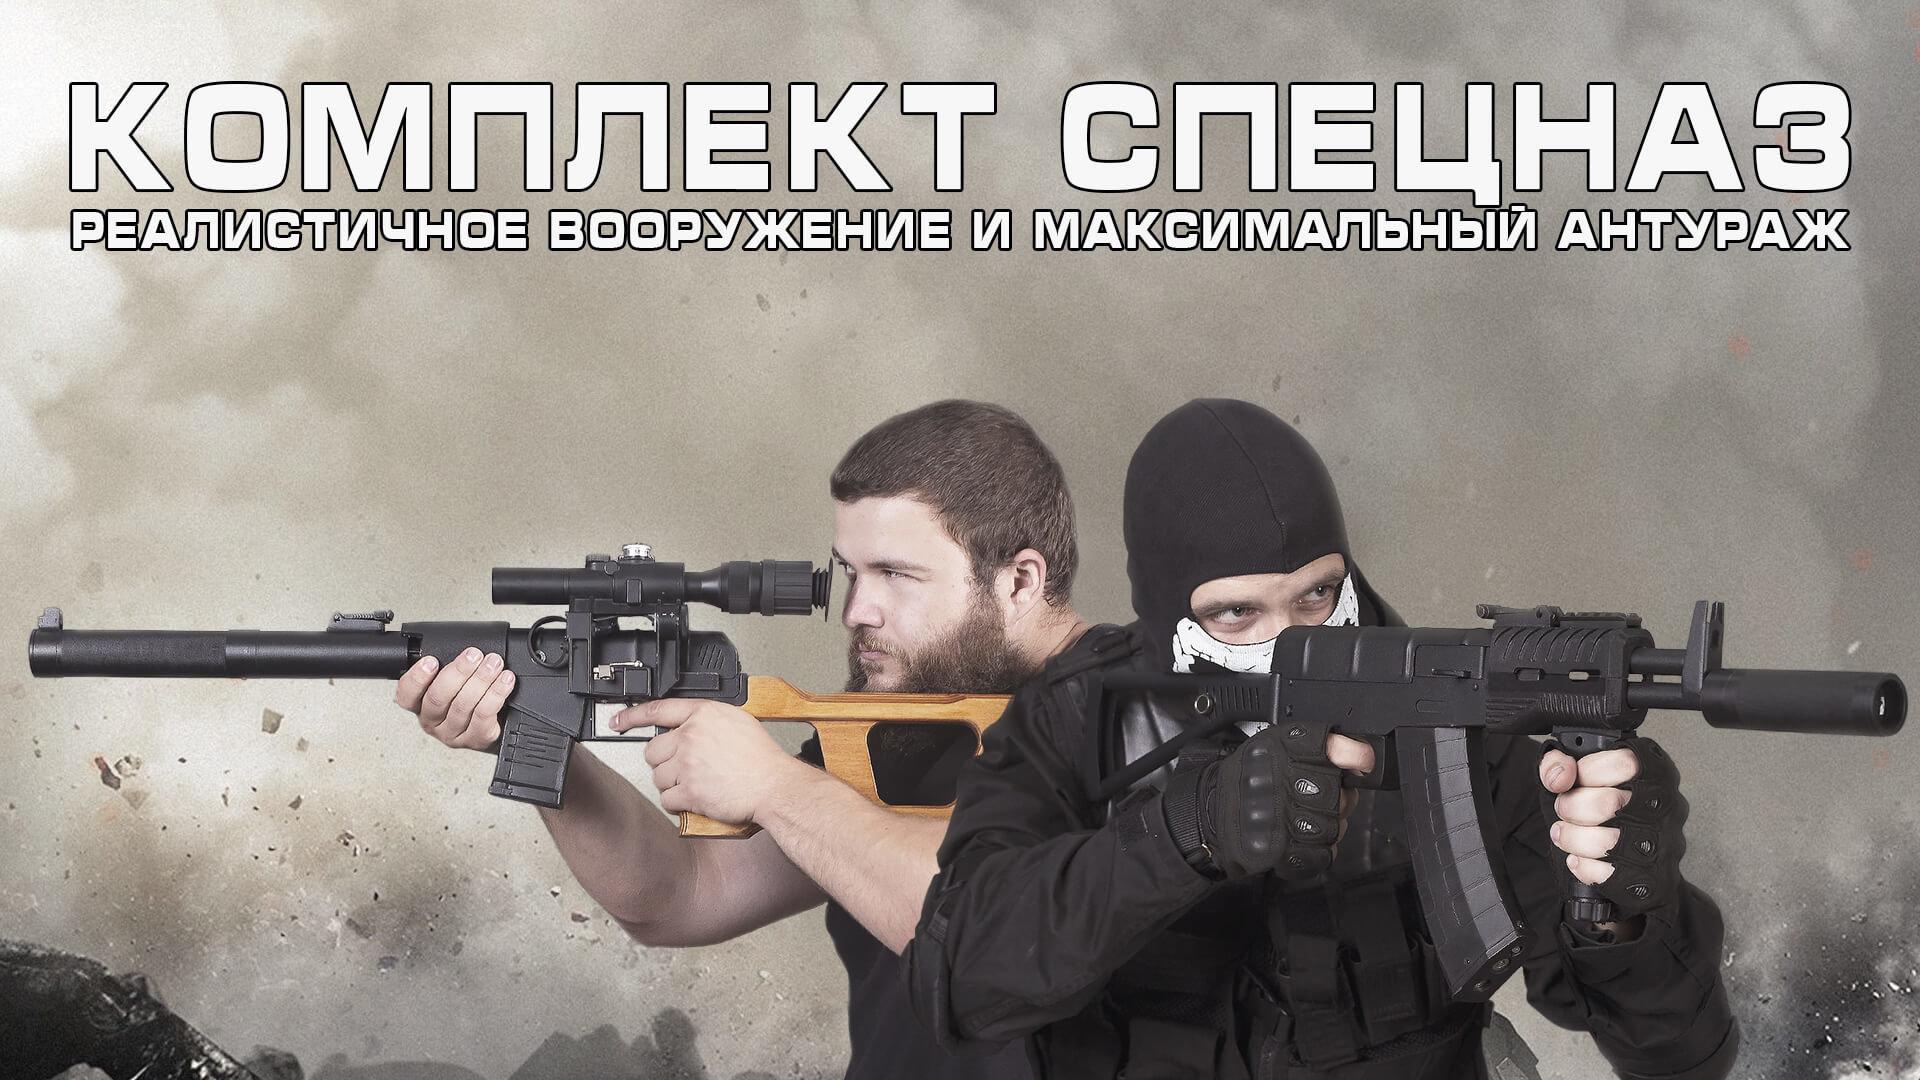 Комплект_Спецназ